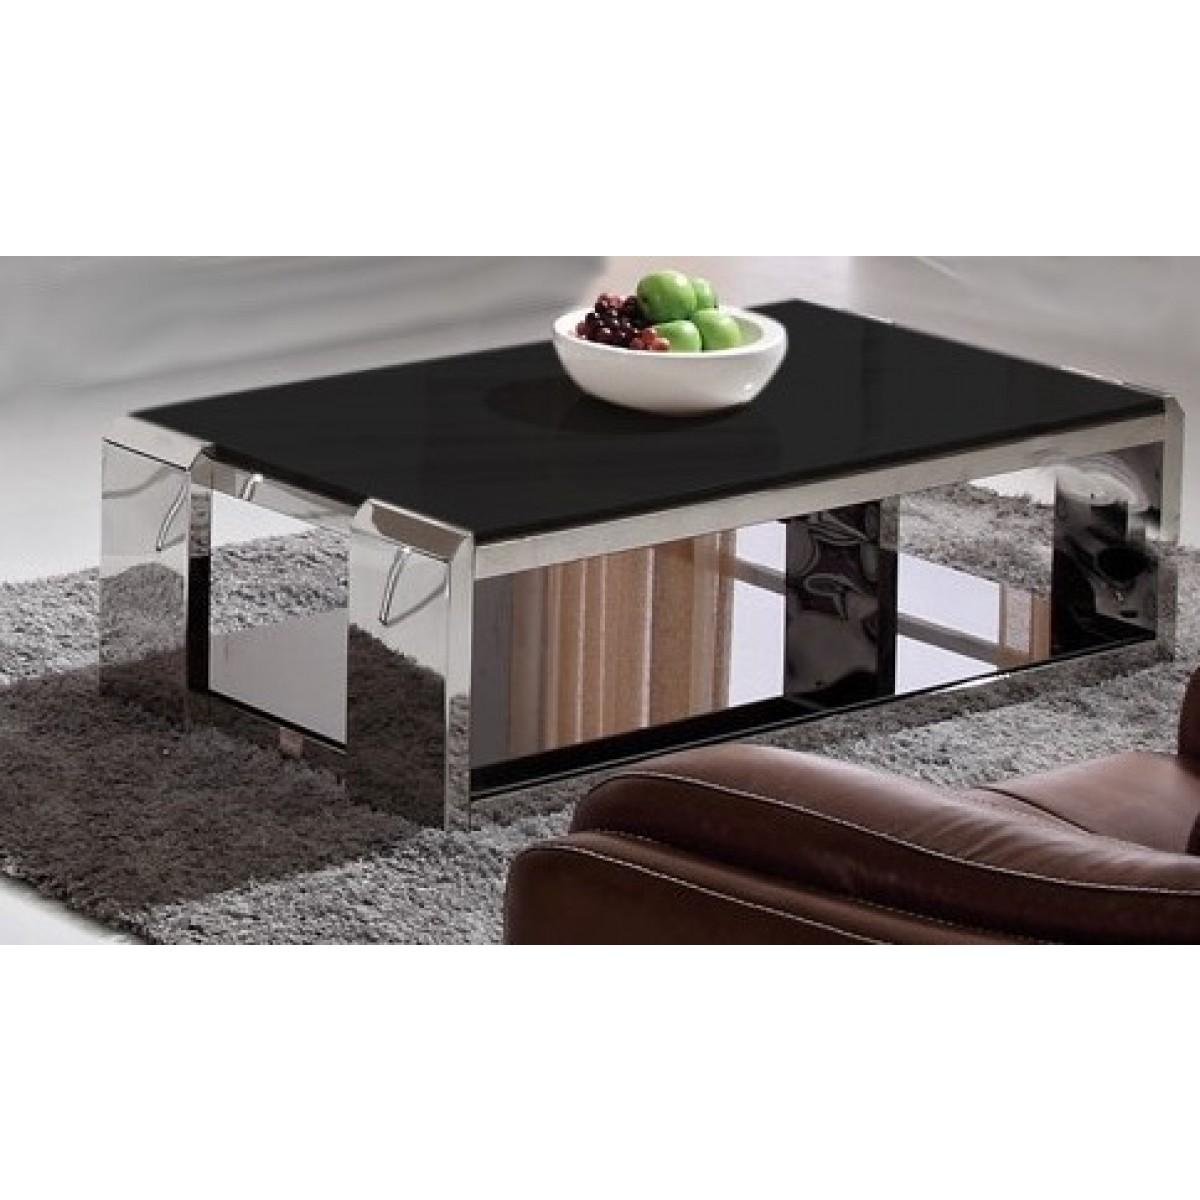 Table Basse En Inox destiné table basse en inox neuilly